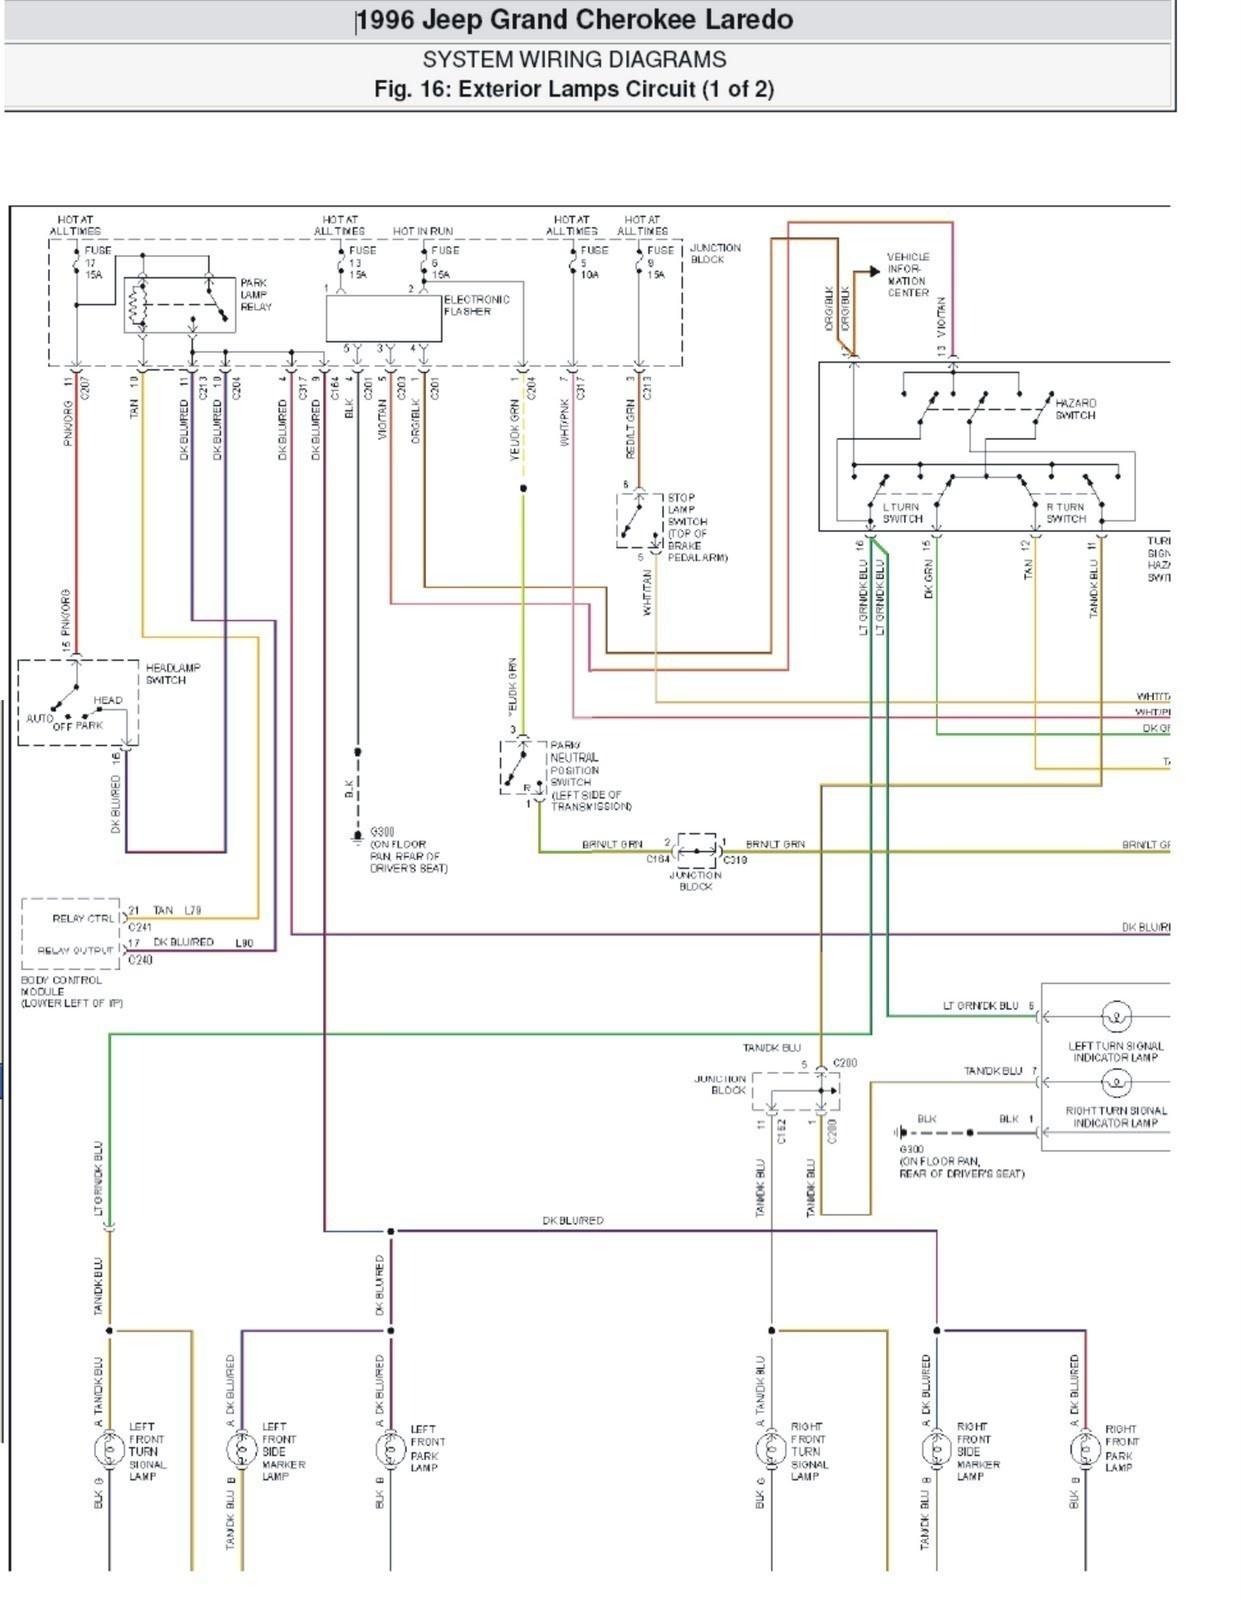 hight resolution of 2000 jeep grand cherokee laredo powertrain wiring harness 92 jeep cherokee alternator wiring 2000 jeep cherokee